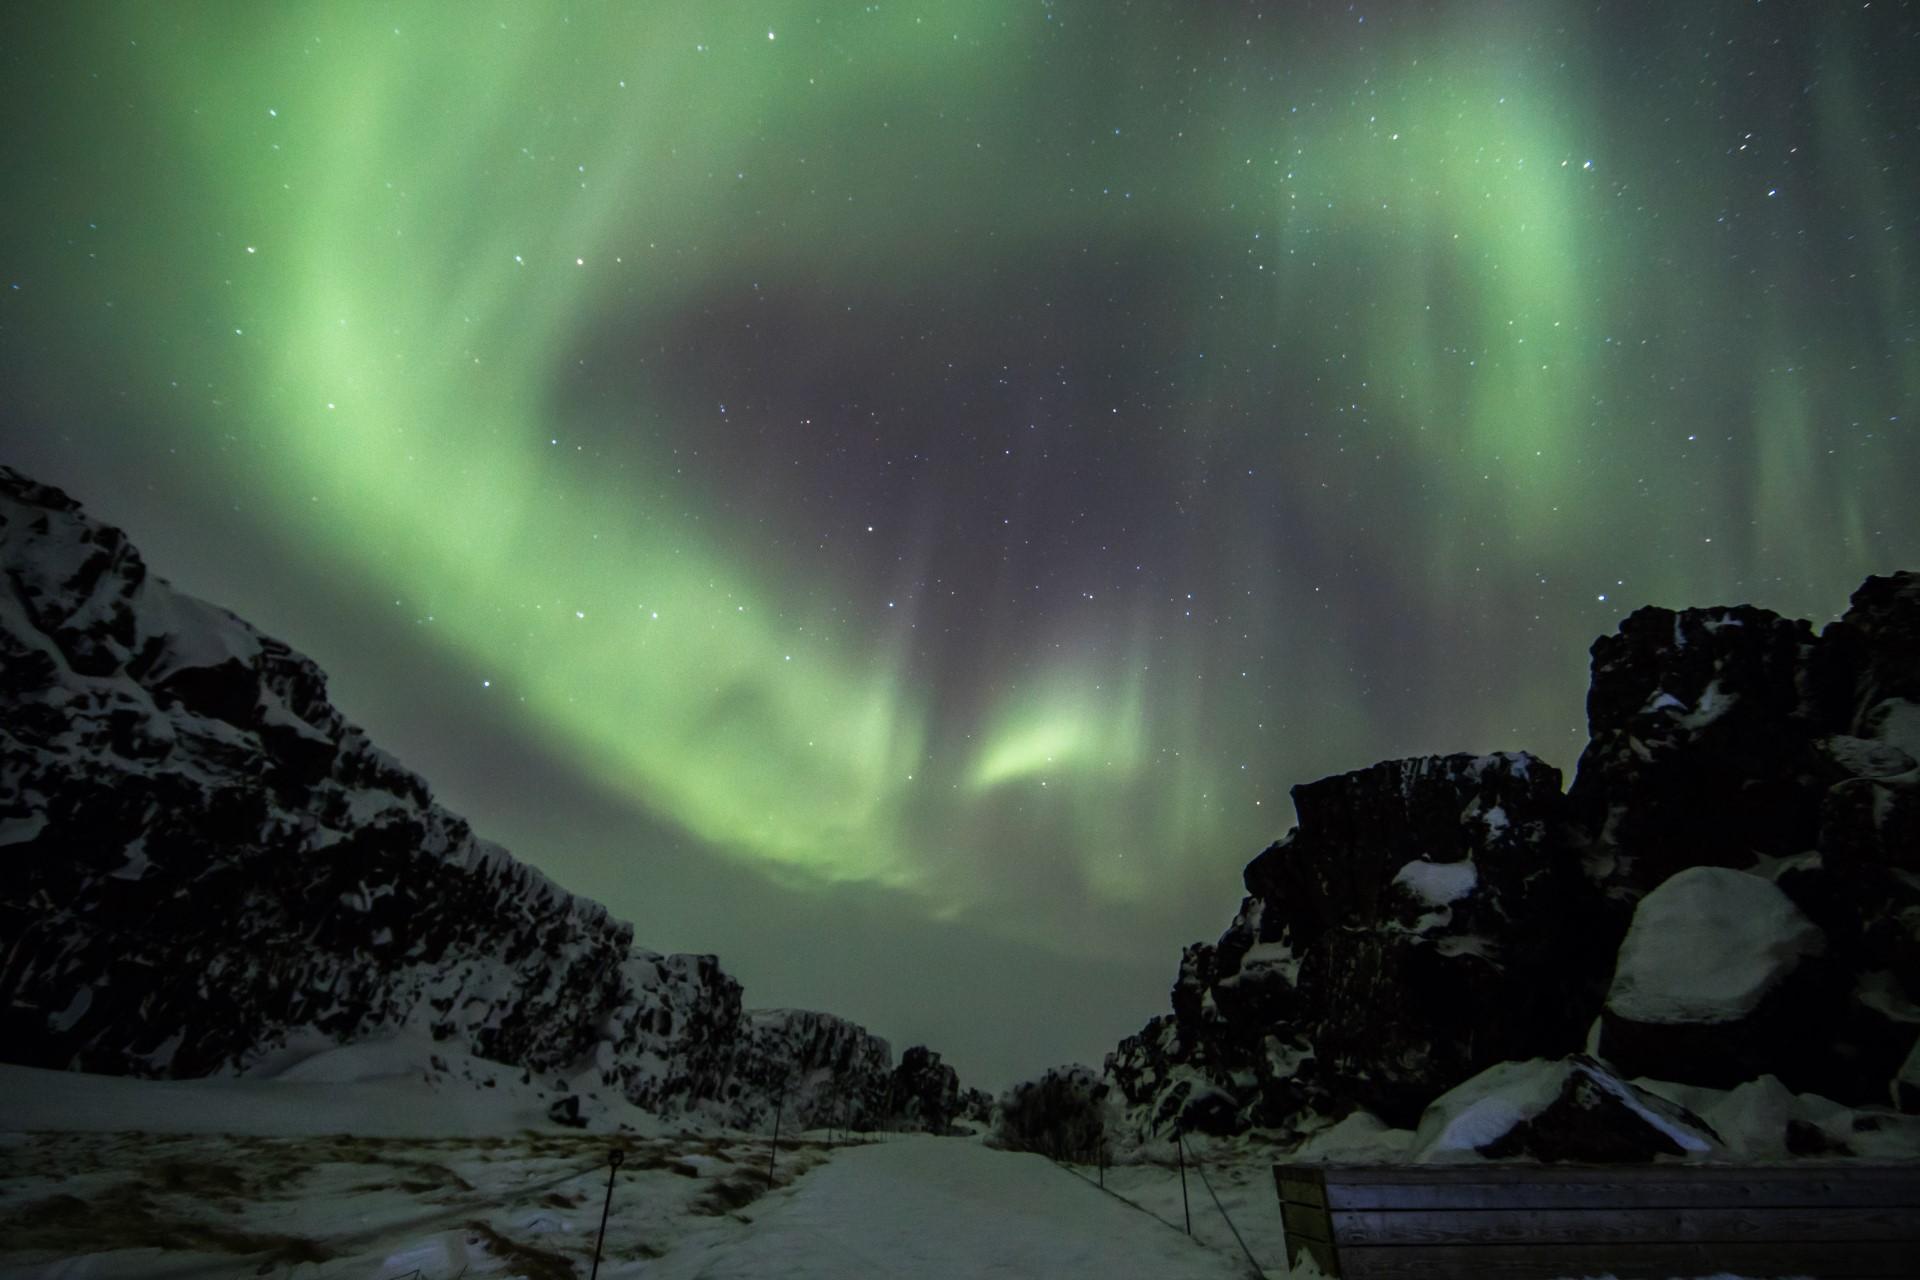 Awesomeaurora borealis